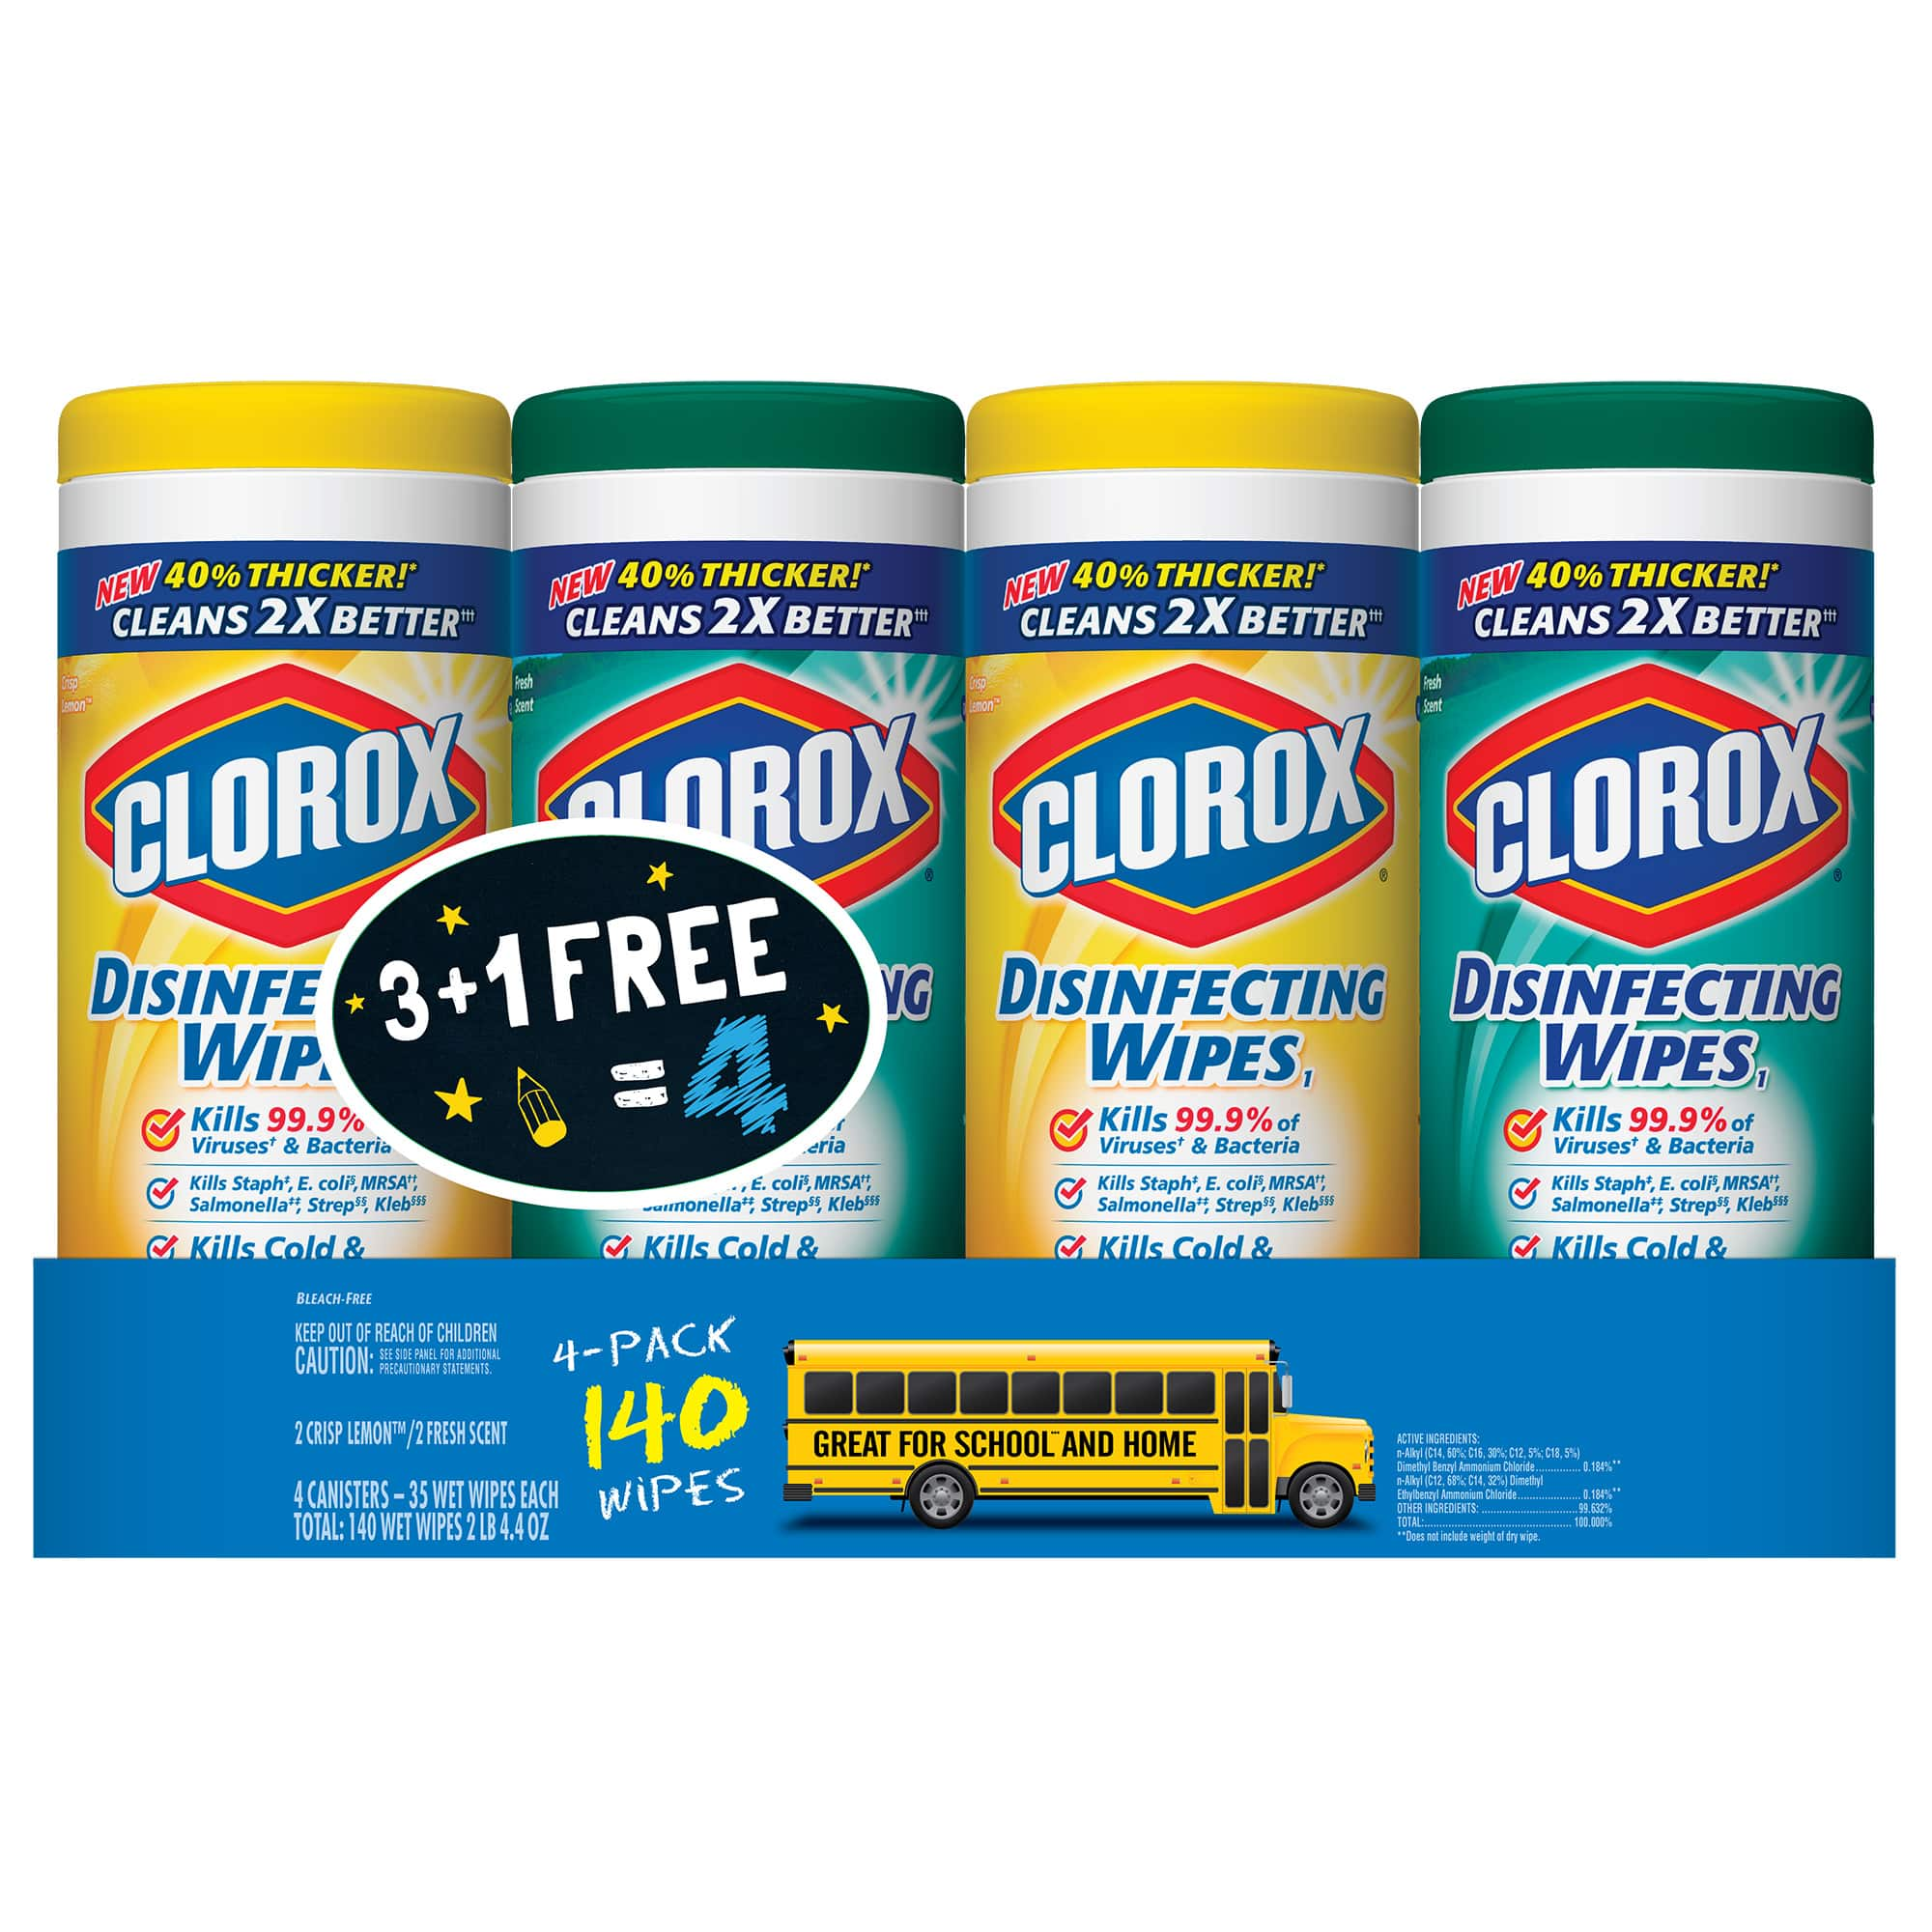 4 Pack Clorox Disinfecting Wipes, Crisp Lemon and Fresh Scent (35-Ct Each) $6.48 @Walmart